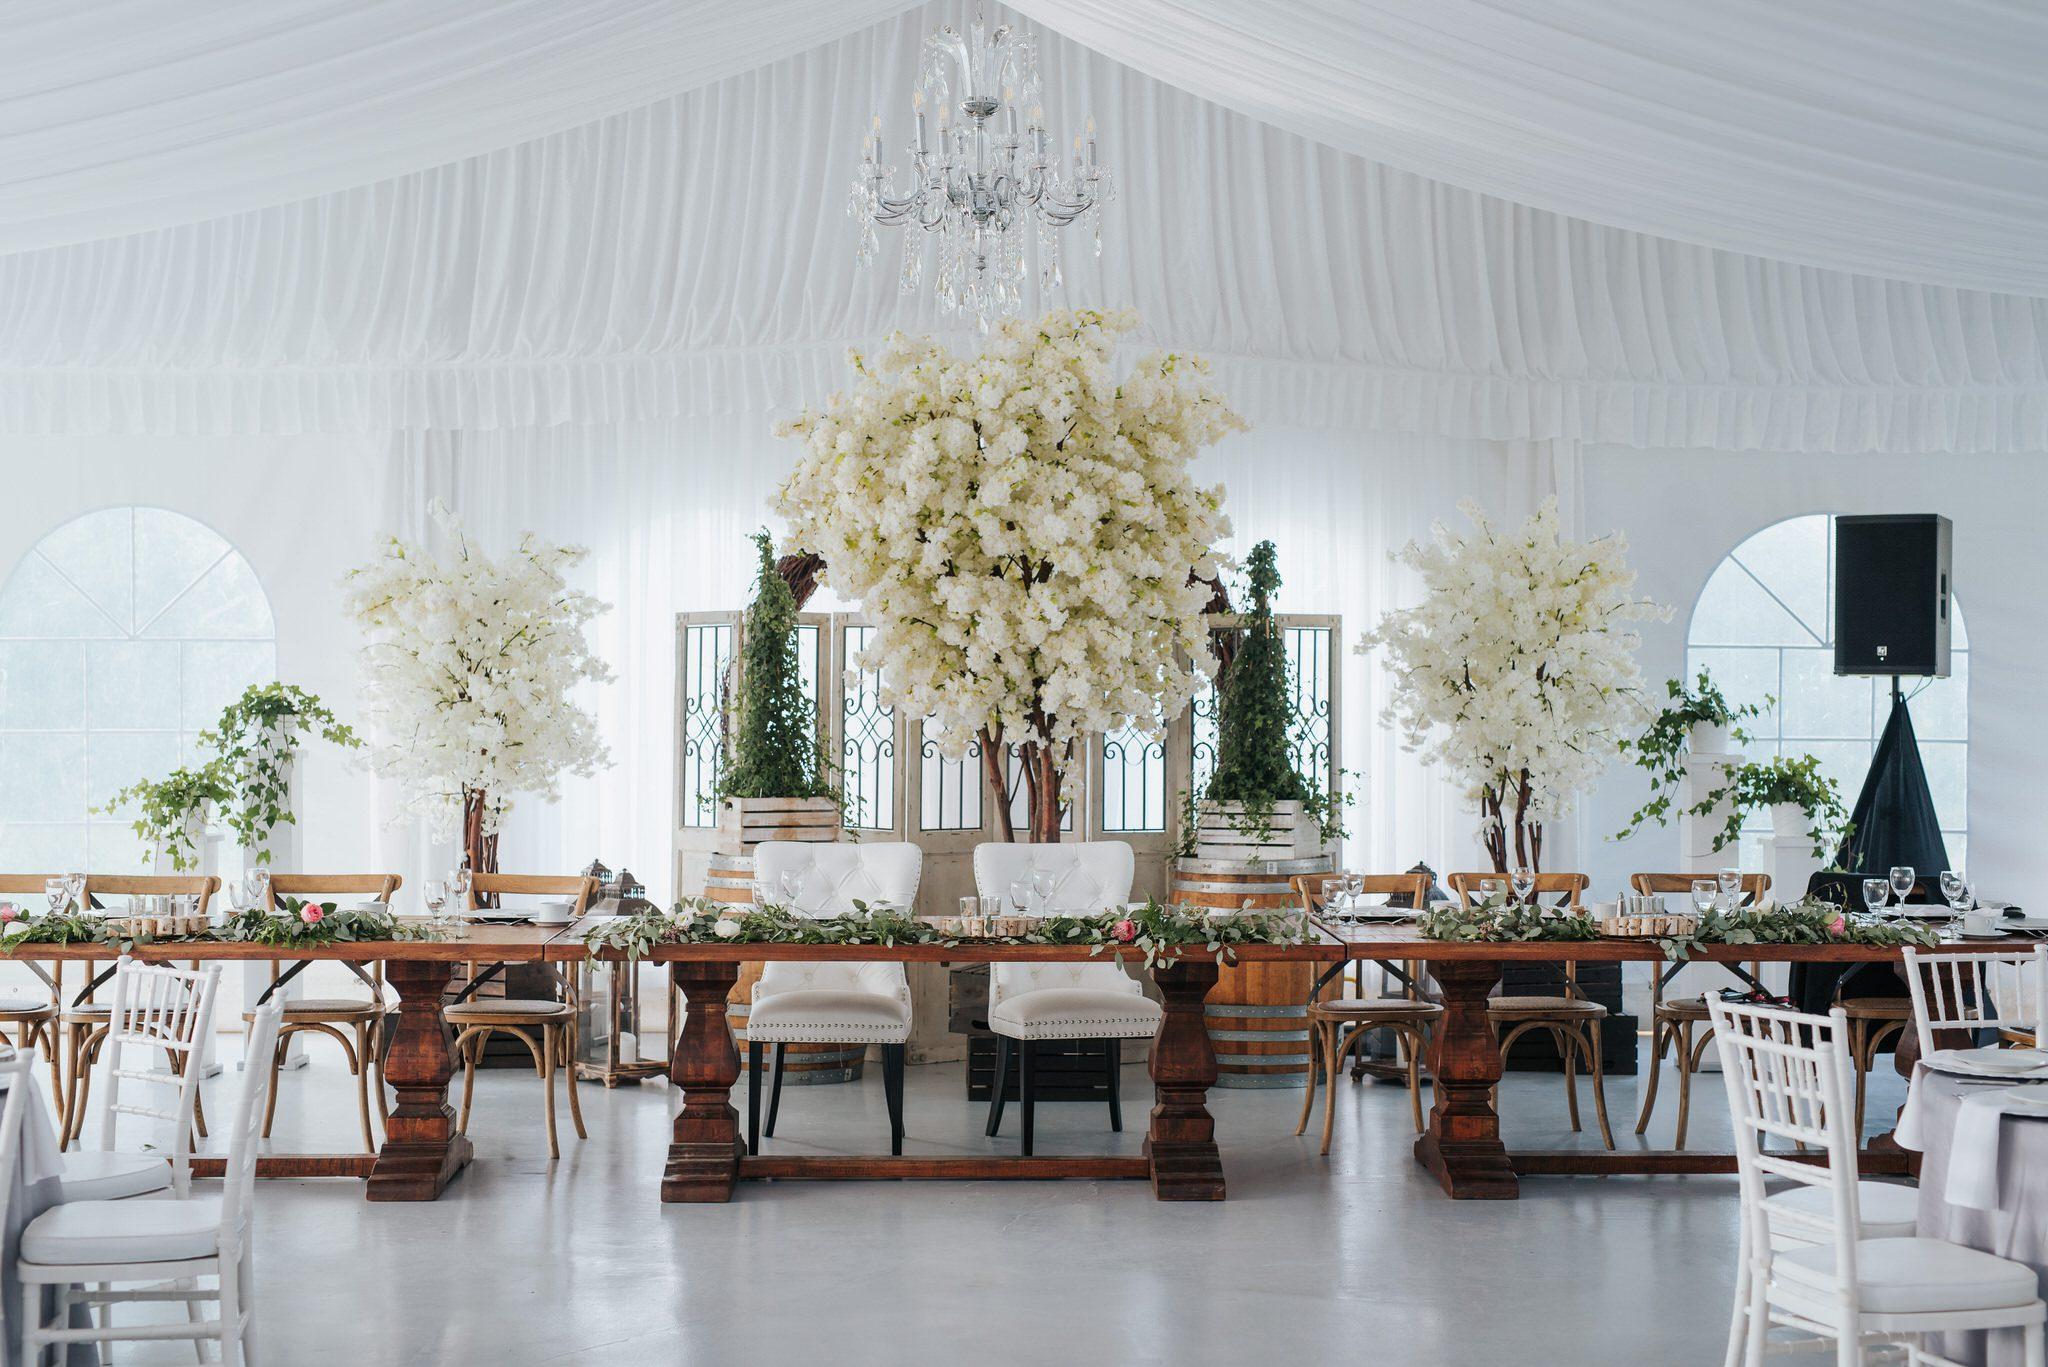 Bloomfield Gardens Wedding - reception decor